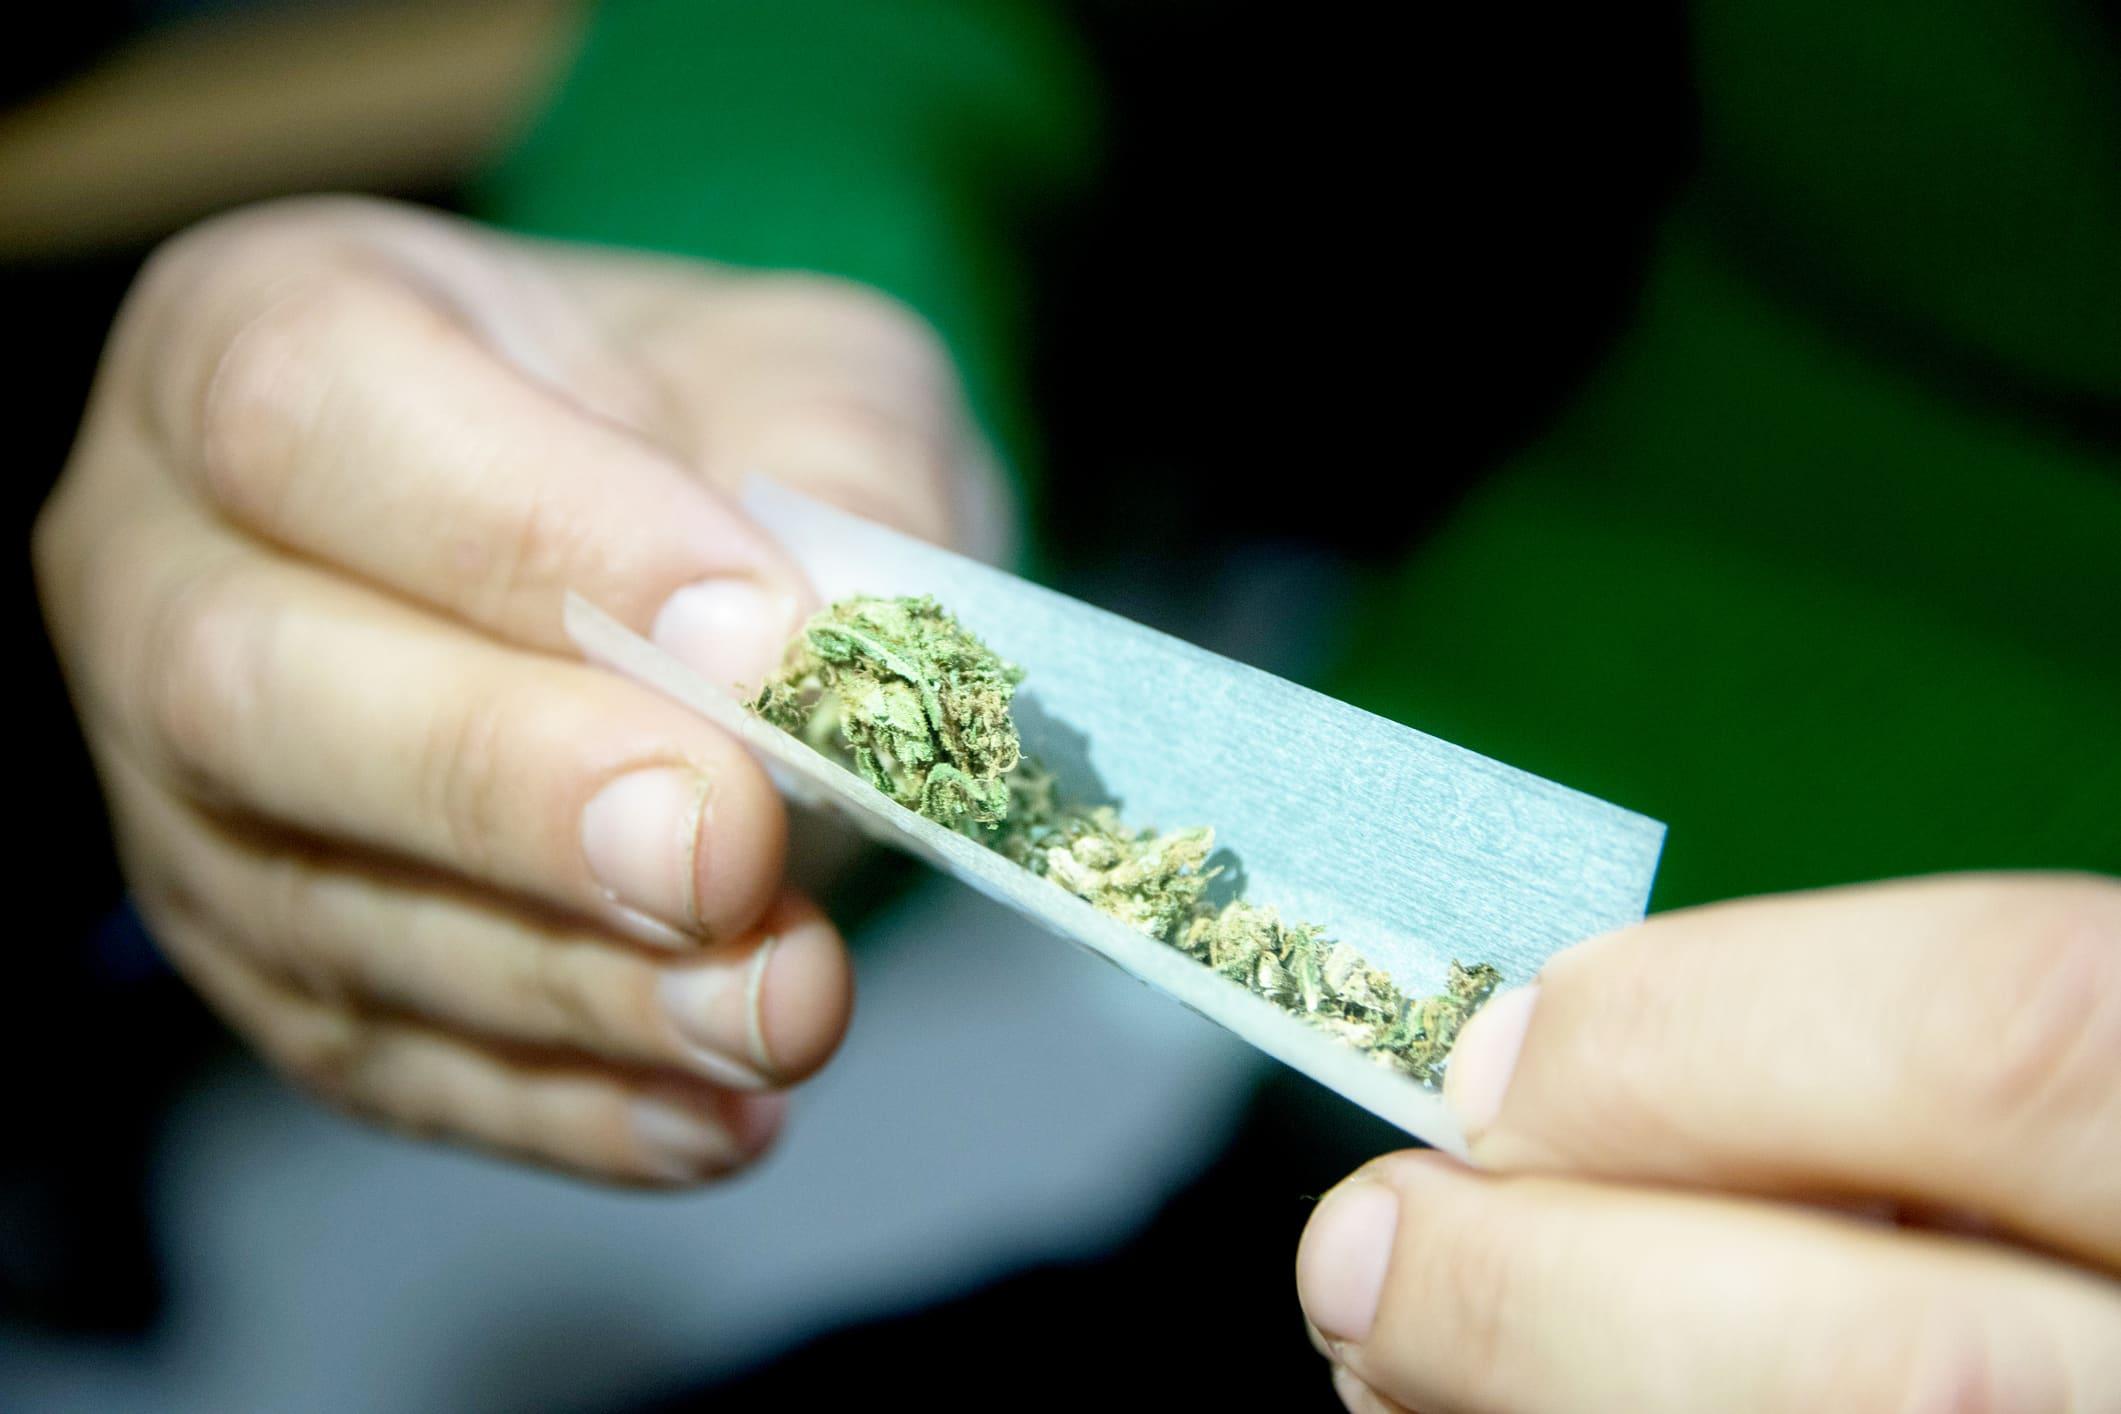 Nadler, Harris to introduce bill decriminalizing pot, expunge prior marijuana convictions